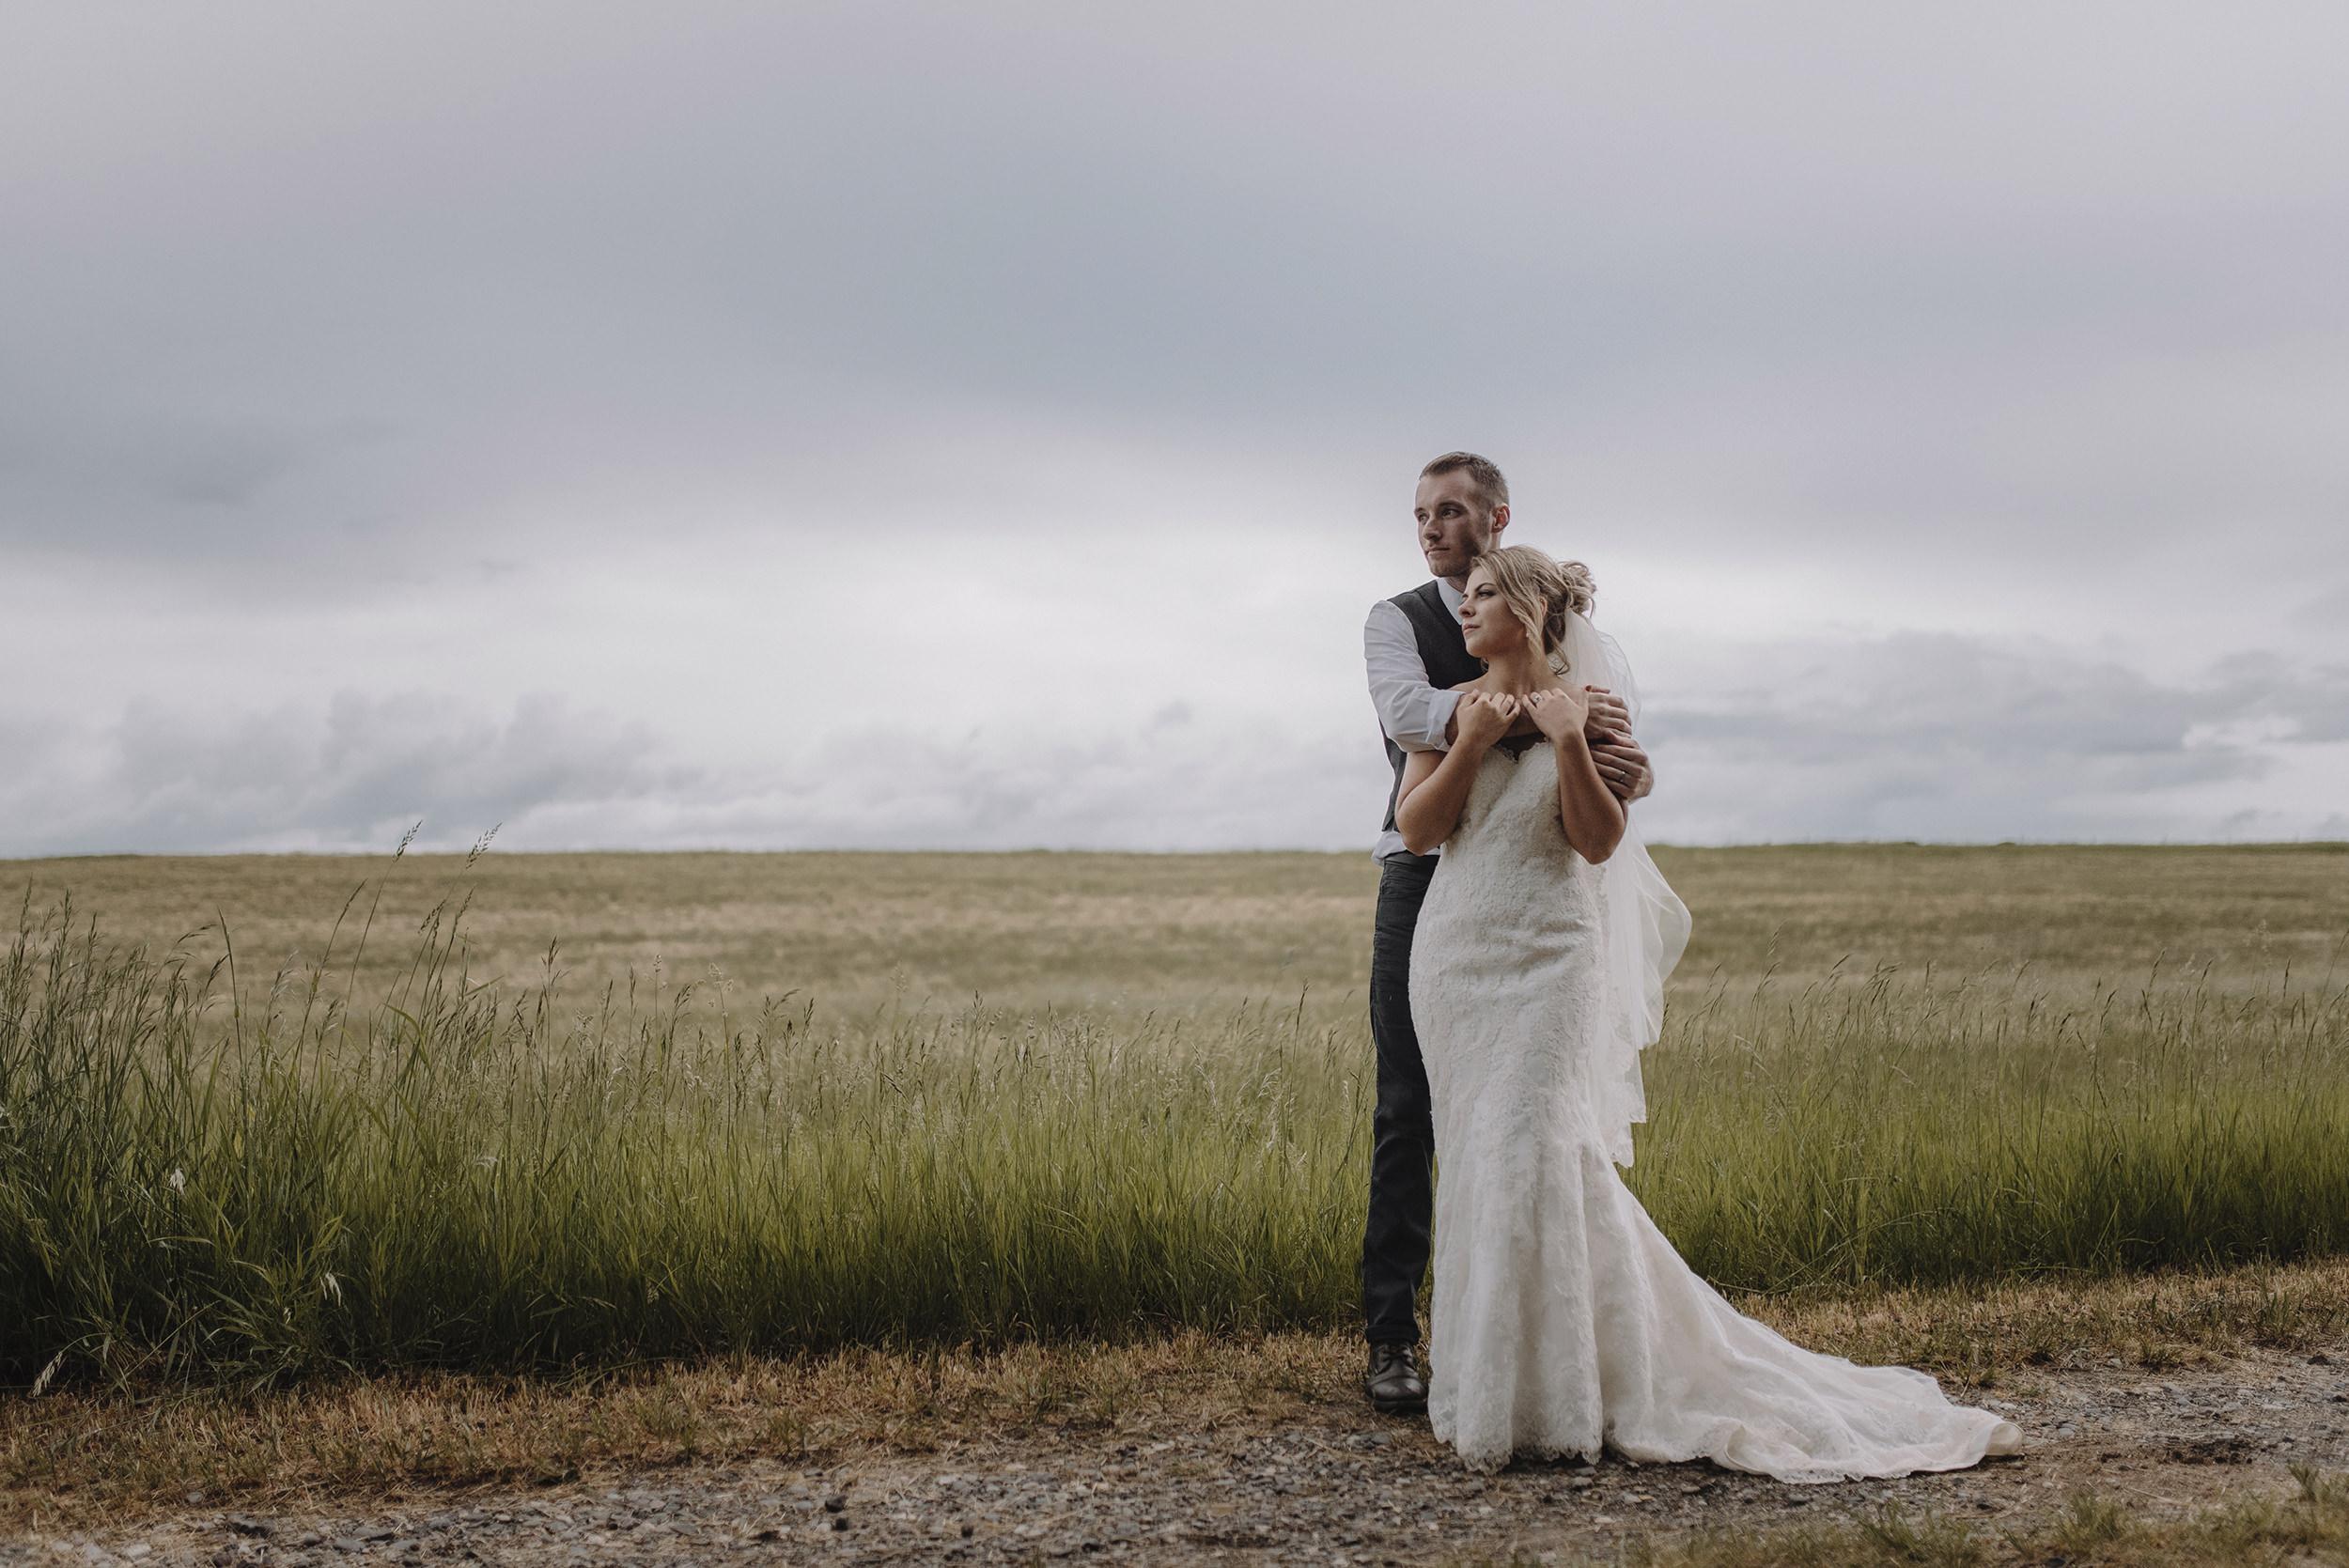 Colby-and-Jess-Intimate-Backyard-Wedding-Bozeman-Montana160.jpg